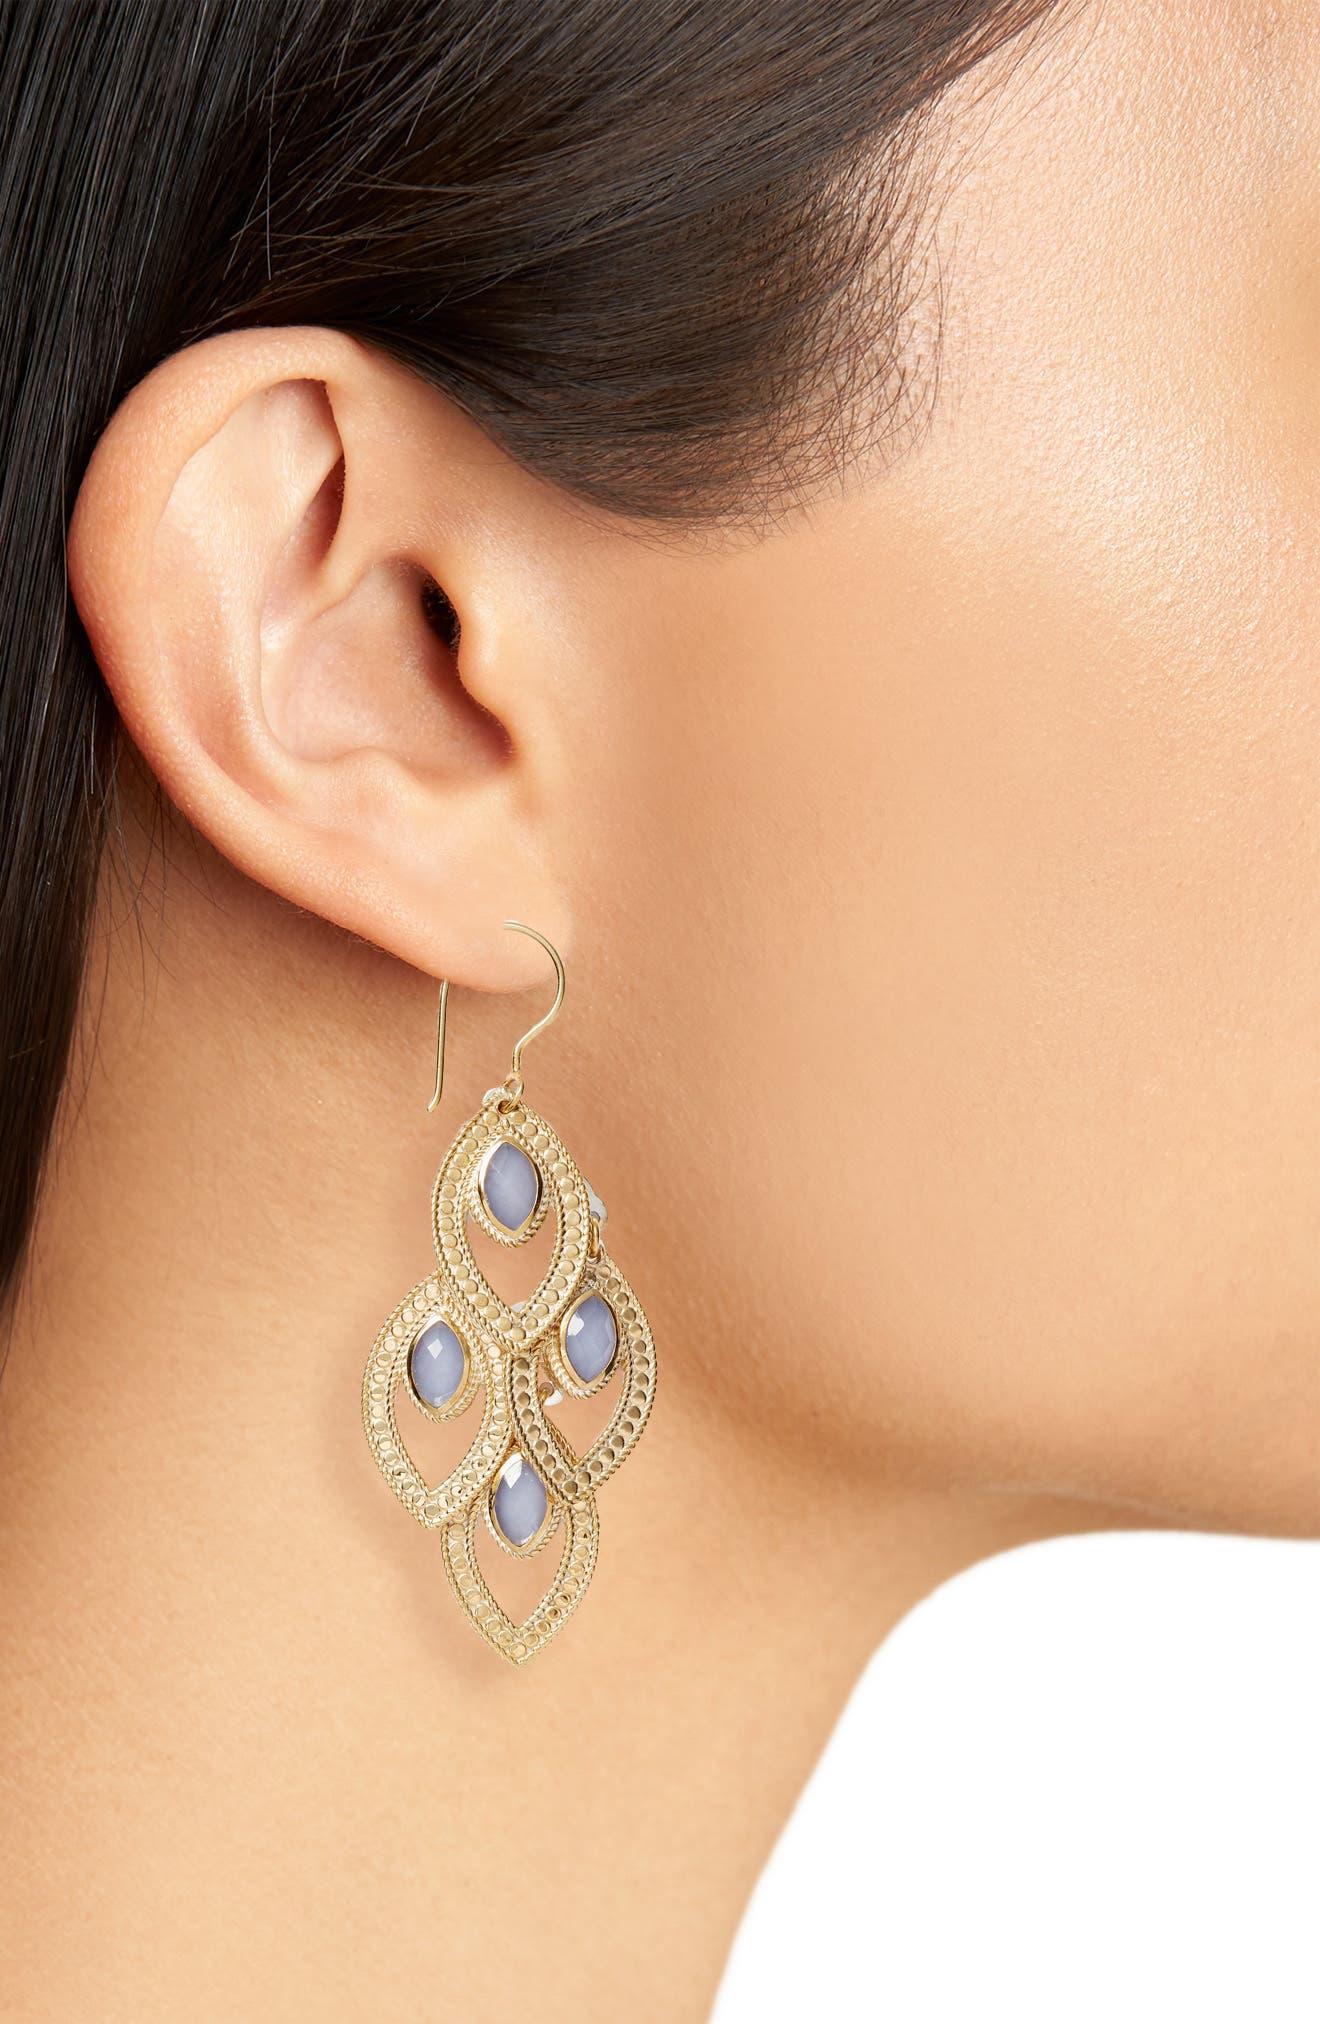 Chandelier Earrings,                             Alternate thumbnail 2, color,                             Gold/ Blue Chalcedony